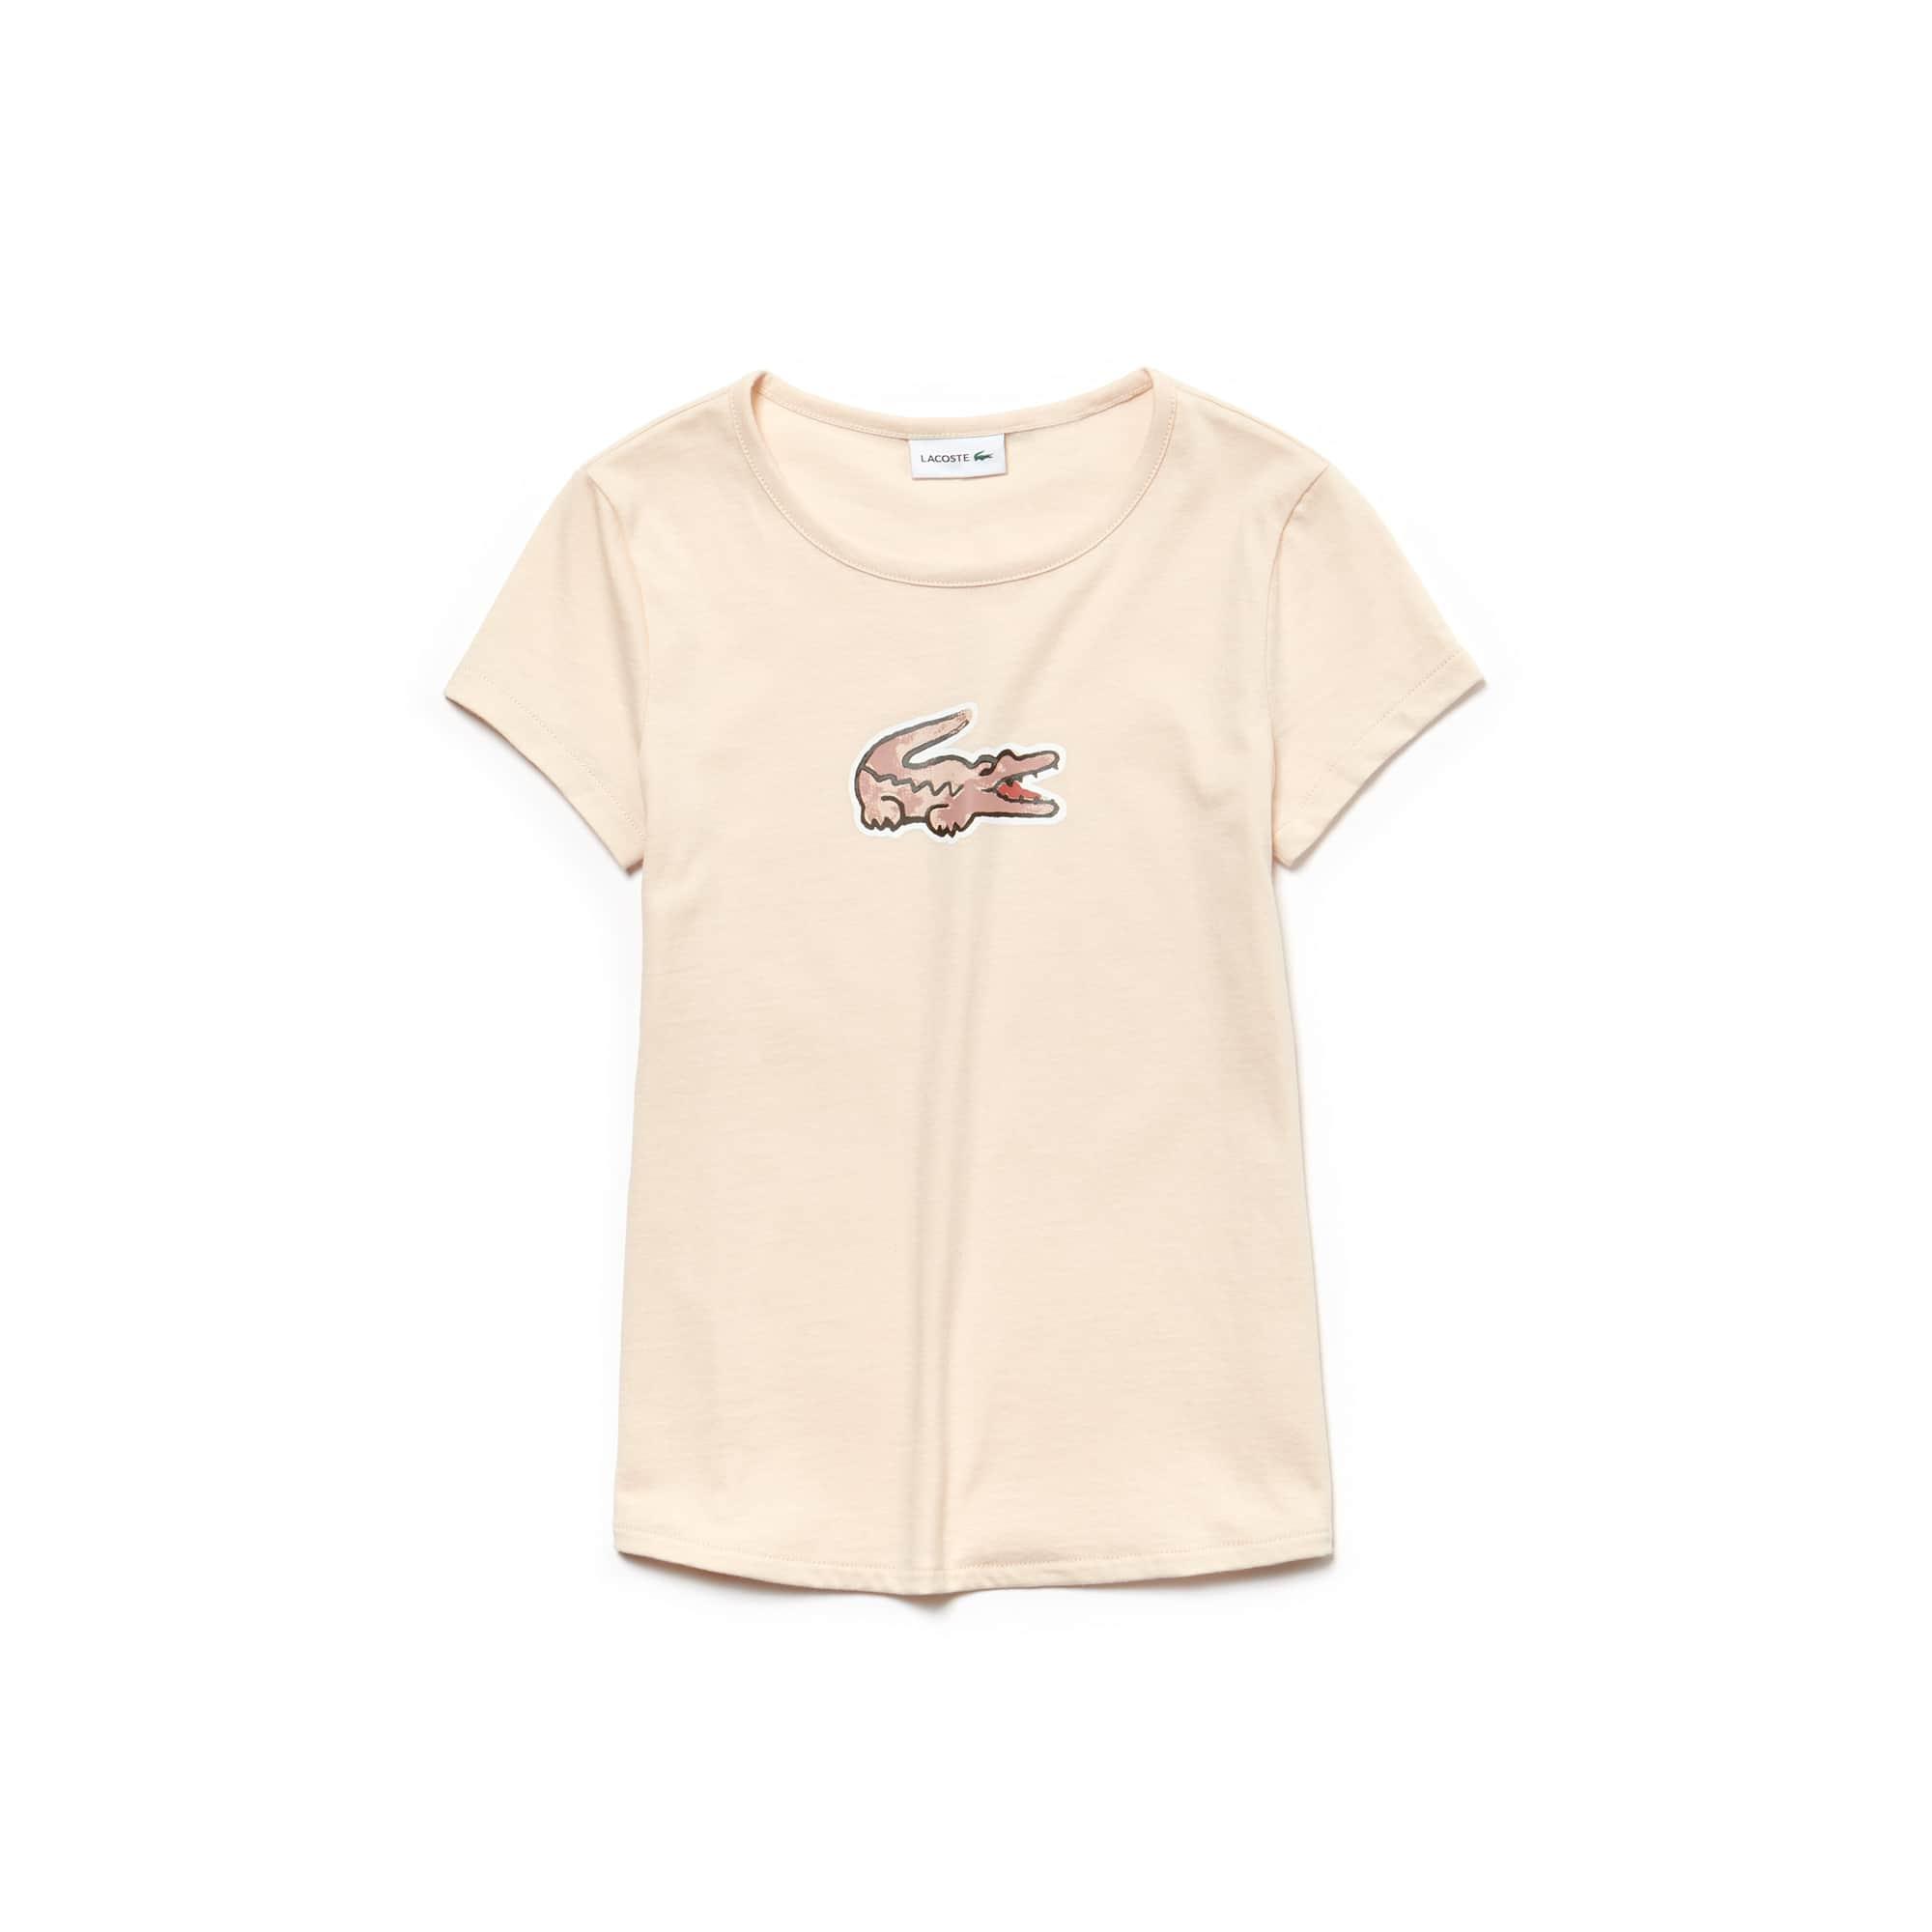 Camiseta Niña Estampado Cocodrilo